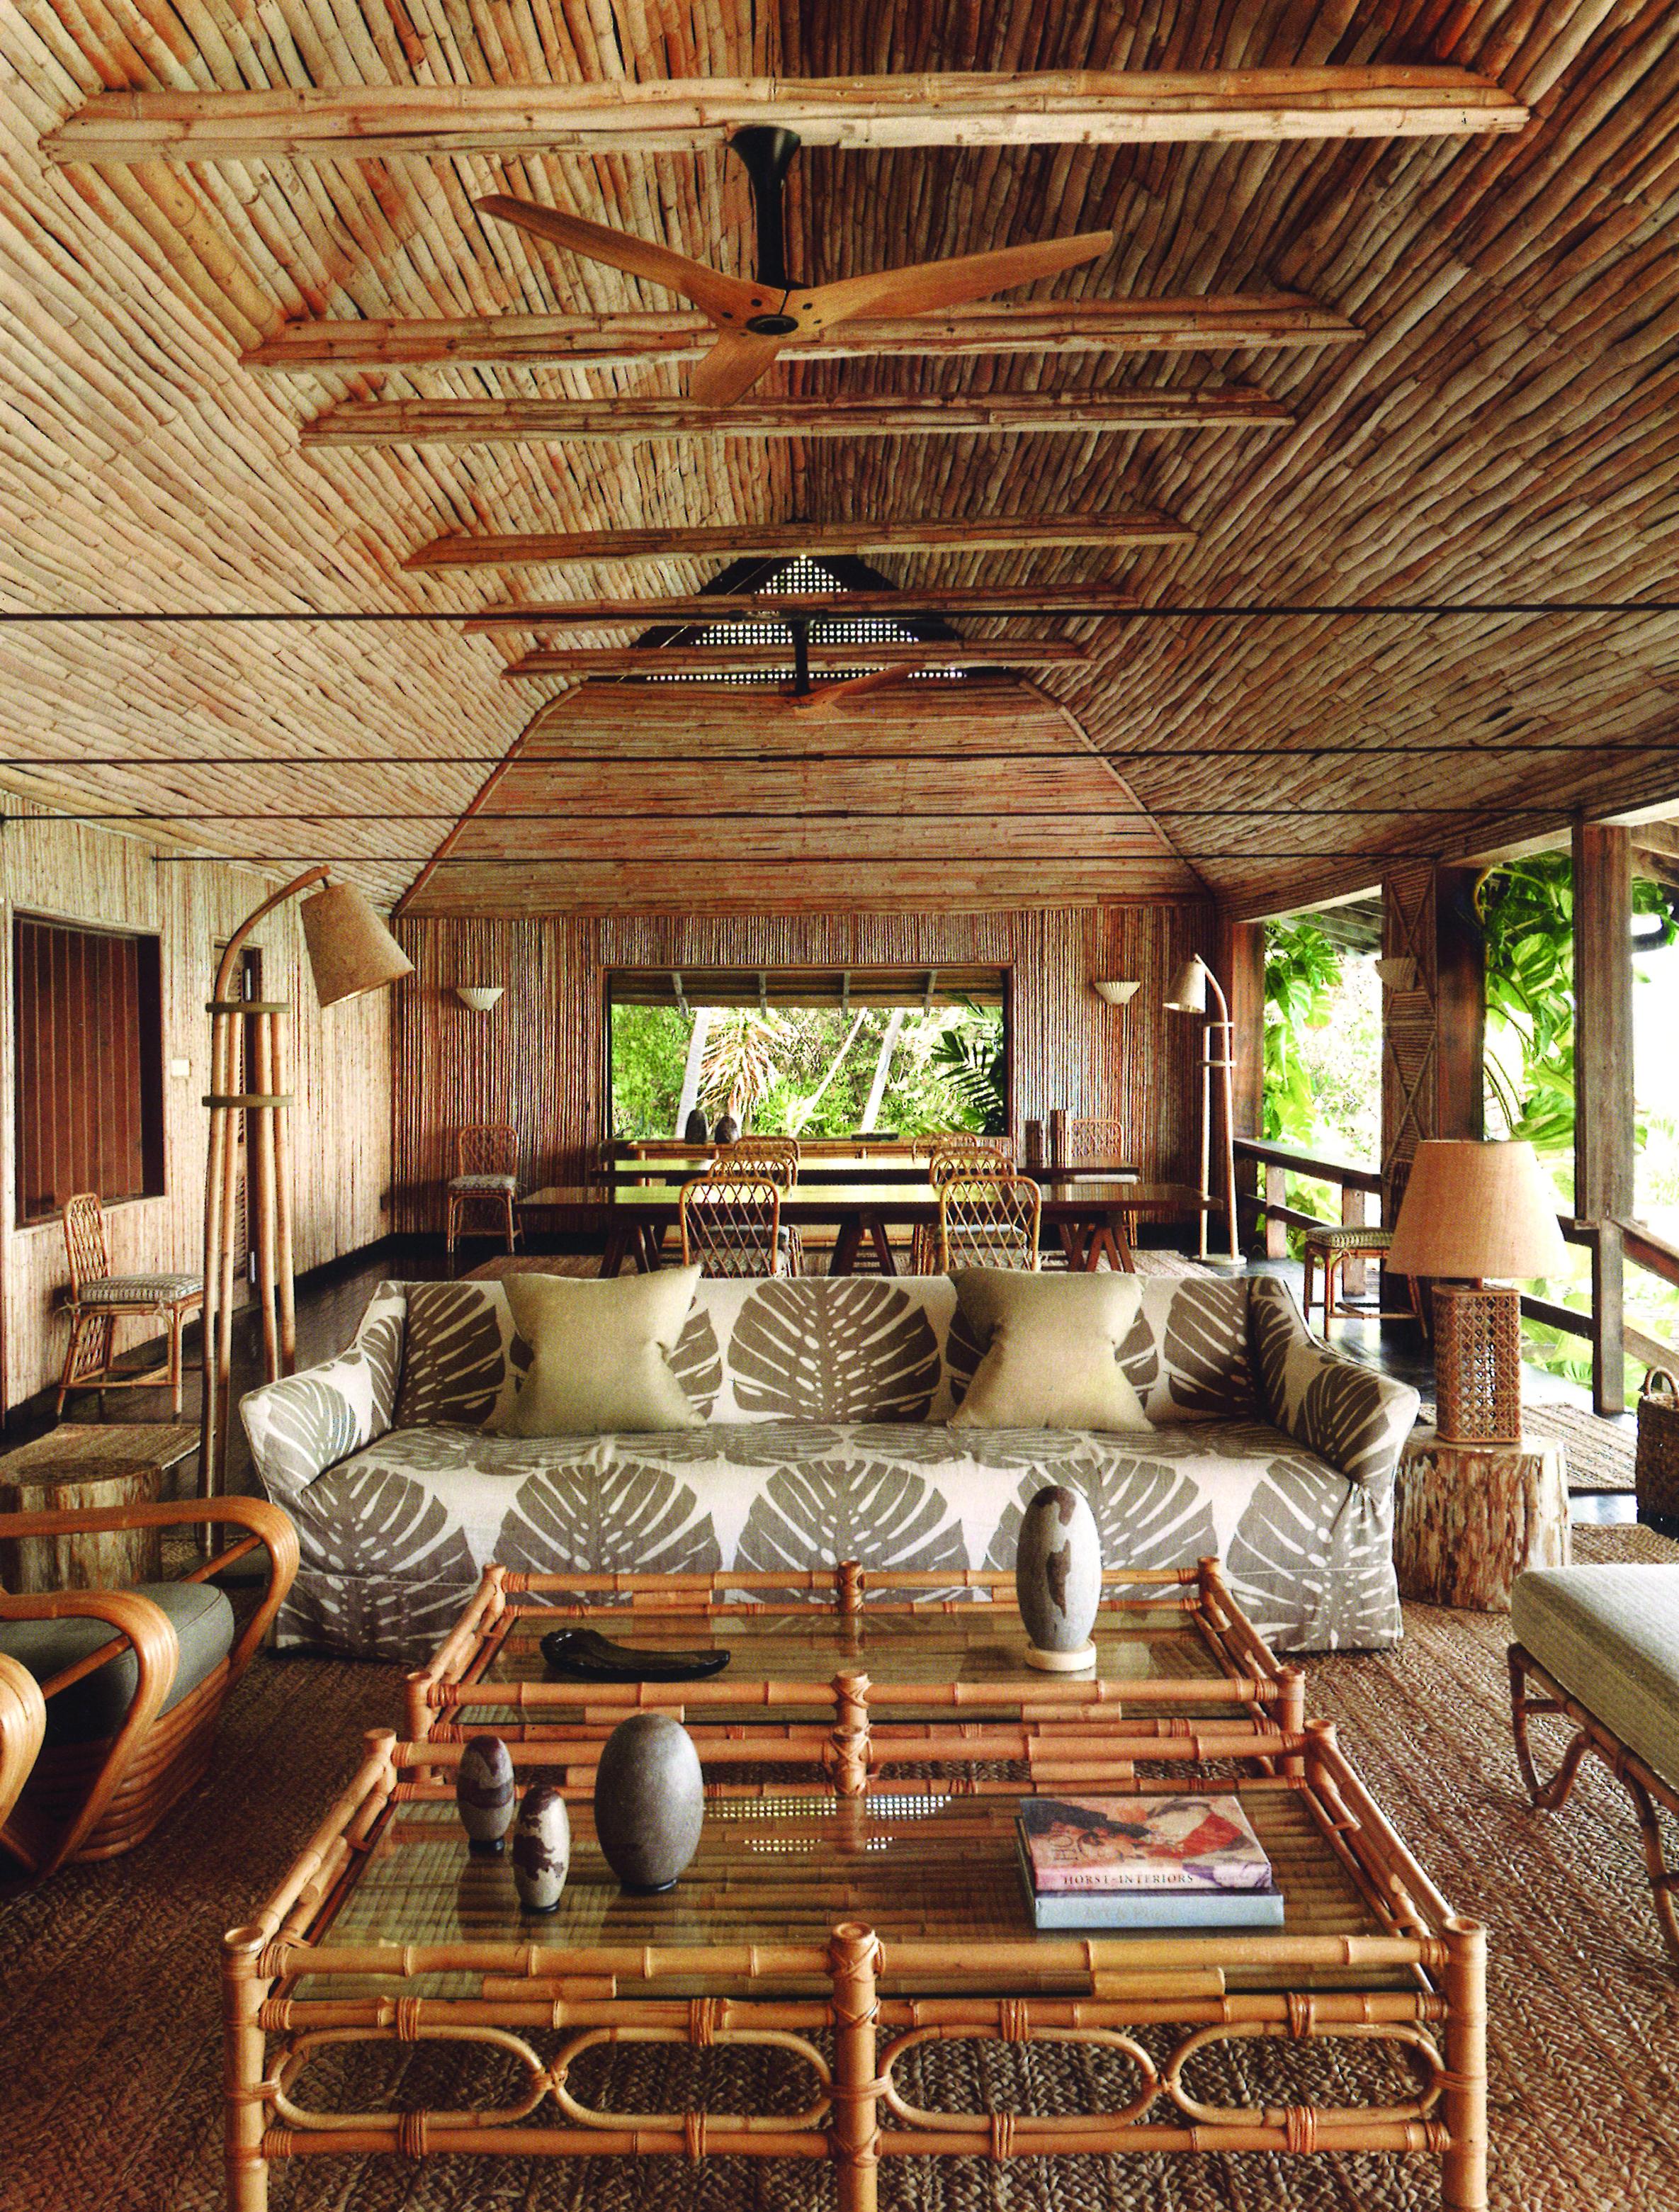 House U0026 Garden. January 2016 · World Of Interiors